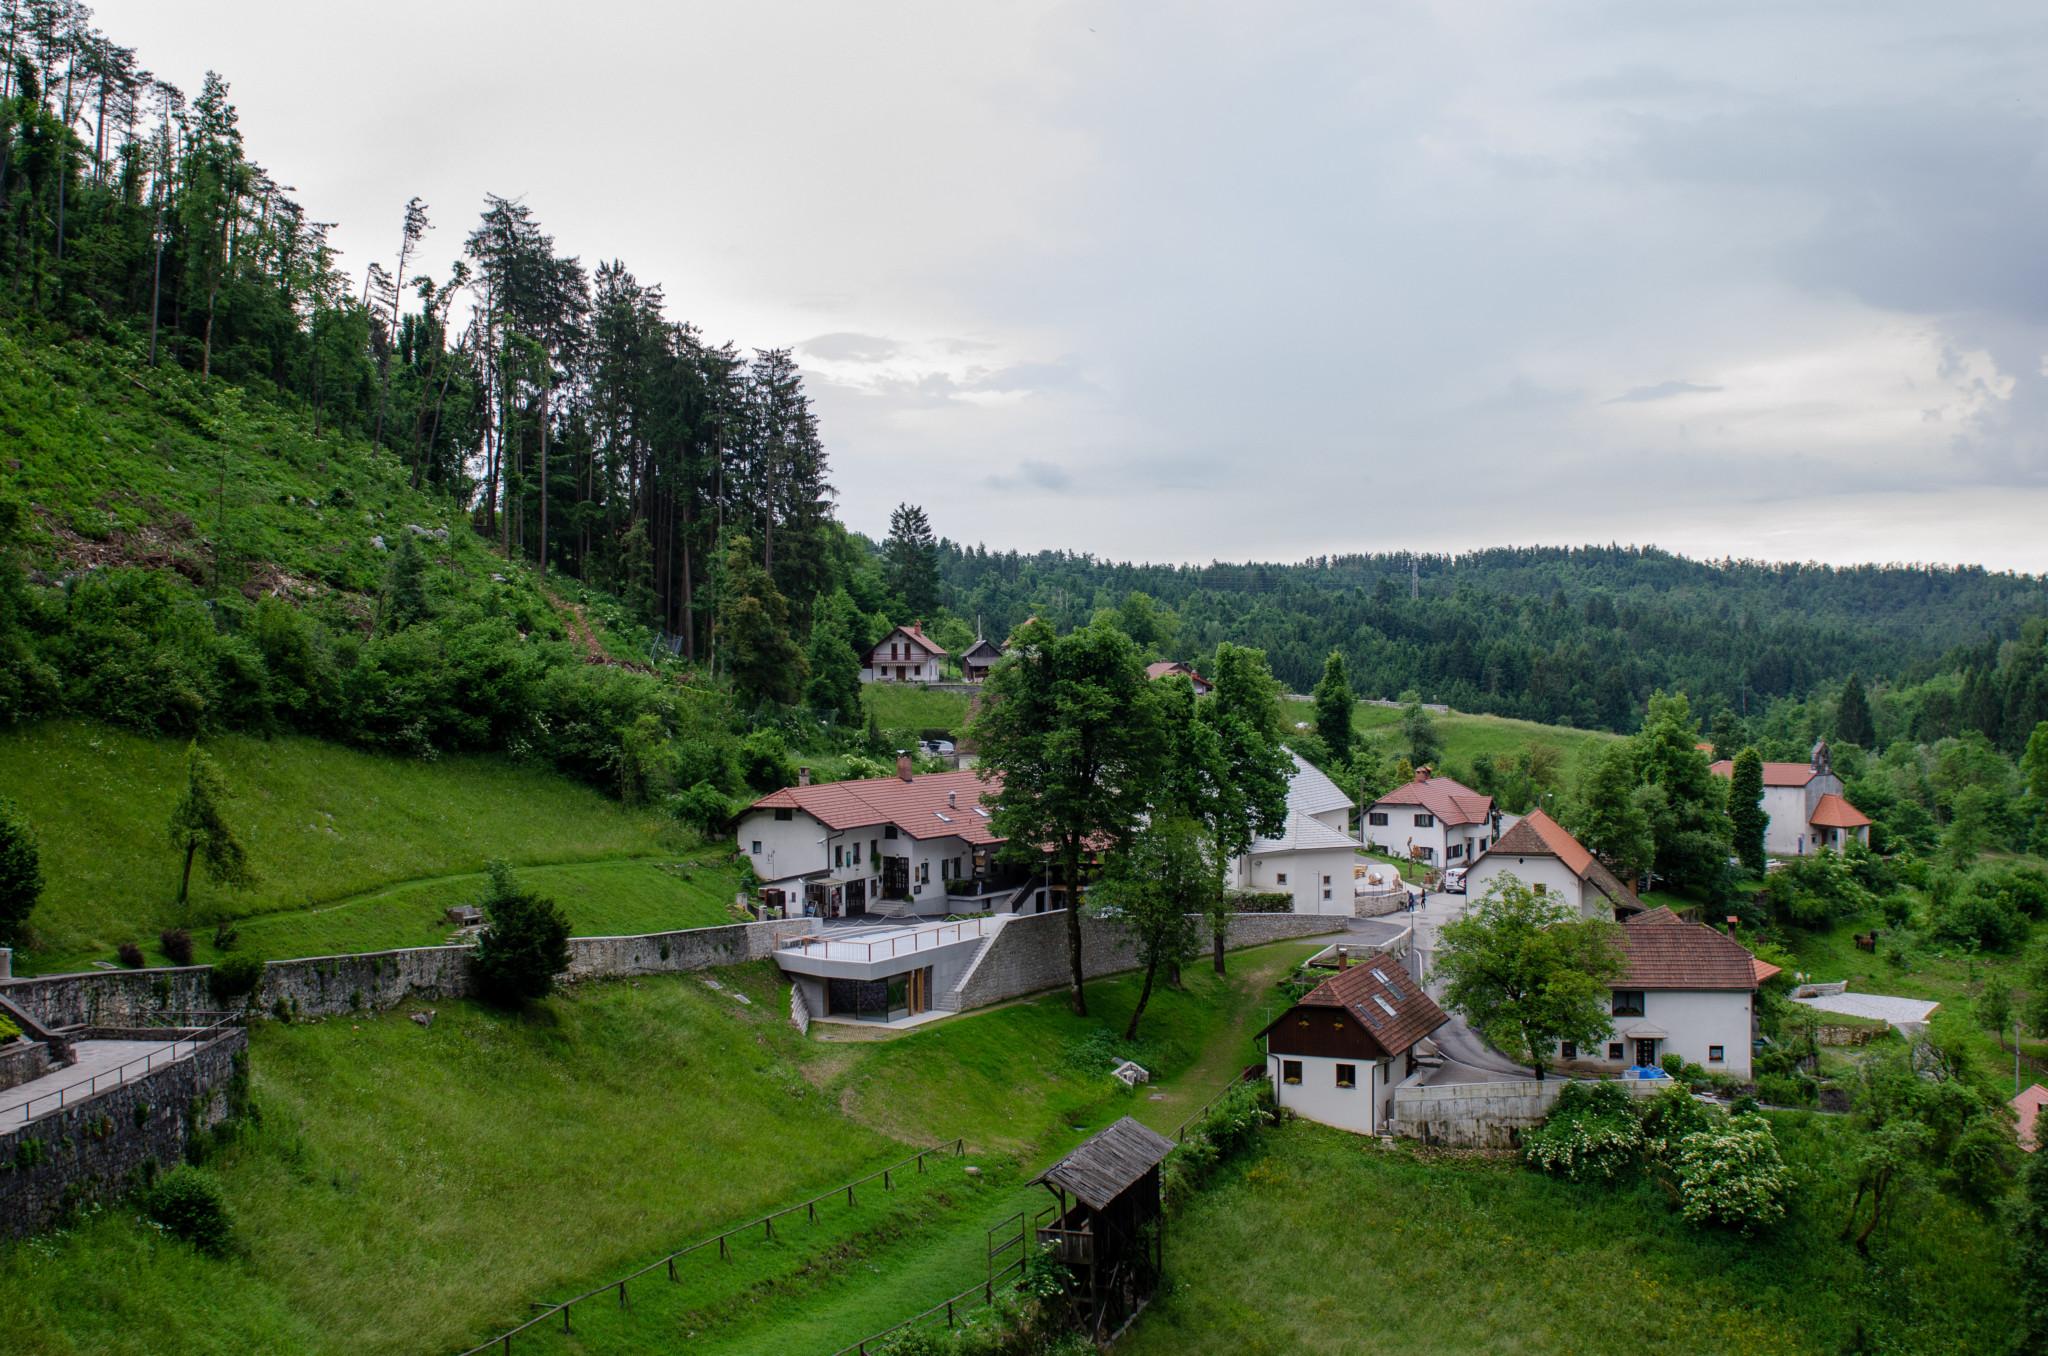 Knallgrüne, hügelige Landschaft in den Jülicher Alpen